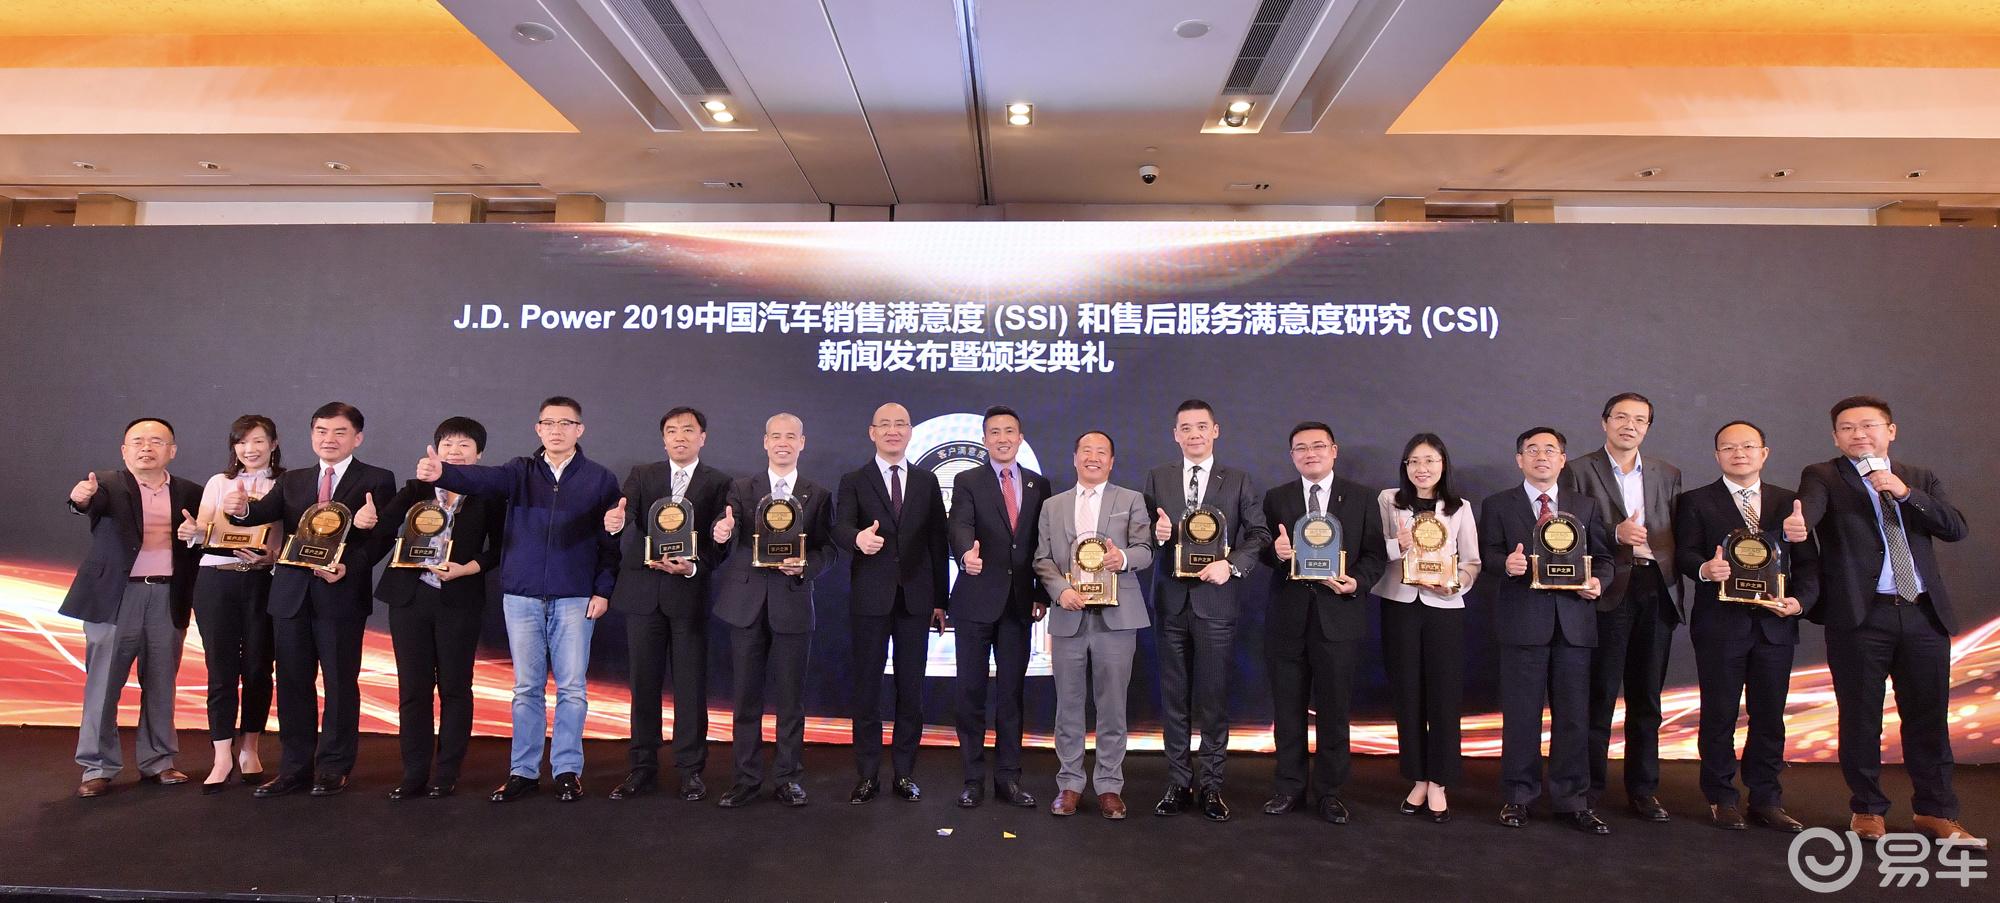 J.D. Power发布中国汽车售后服务满意度报告